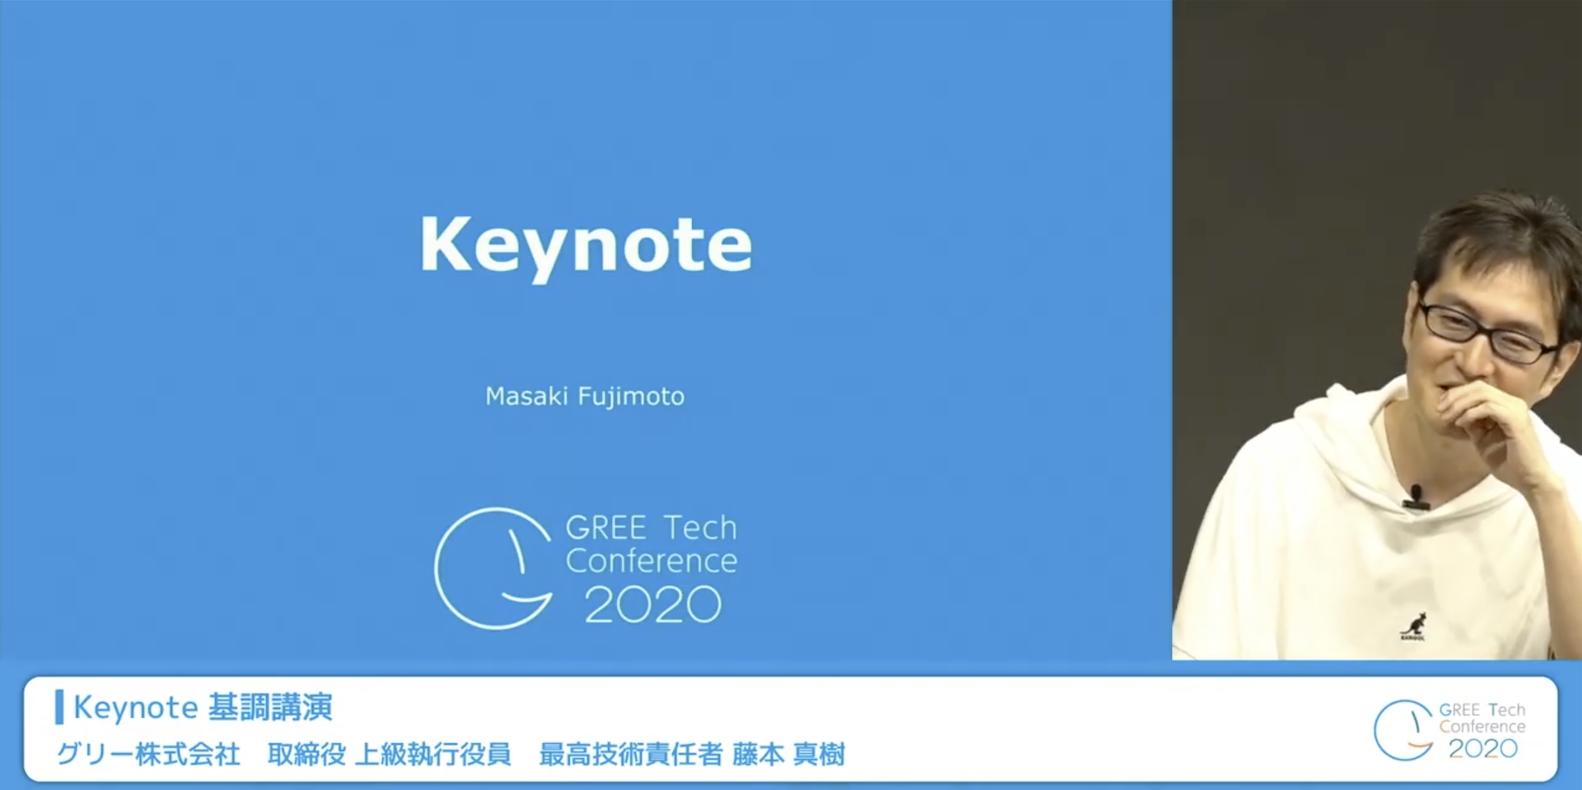 GREE Tech Conference 2020 ご参加ありがとうございました